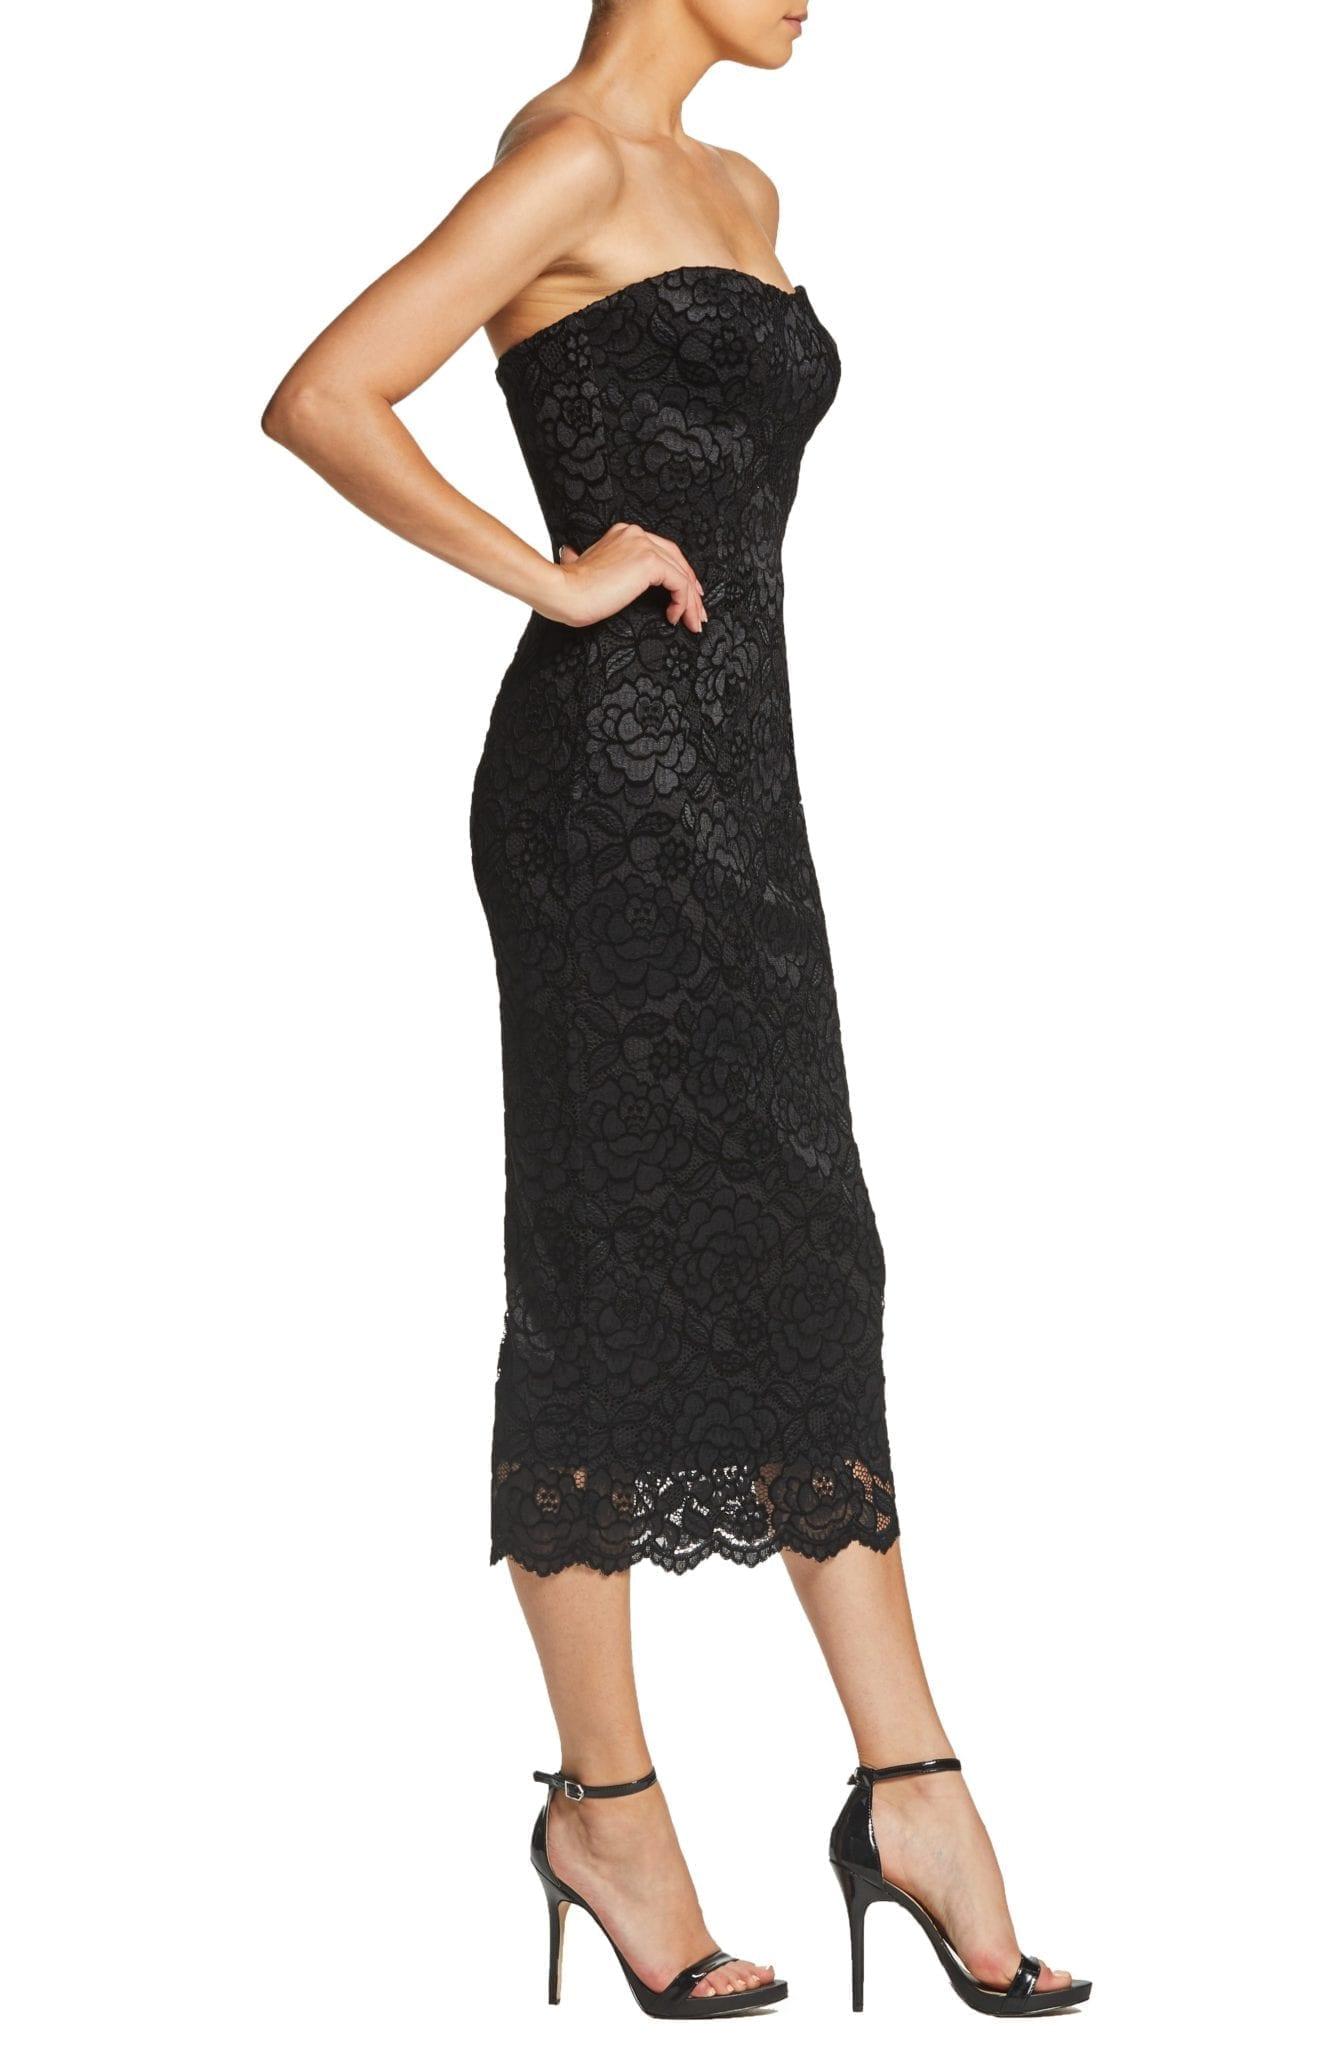 24bda3ca2ca93 DRESS THE POPULATION Claire Strapless Velvet Lace Midi Black / Charcoal  Dress